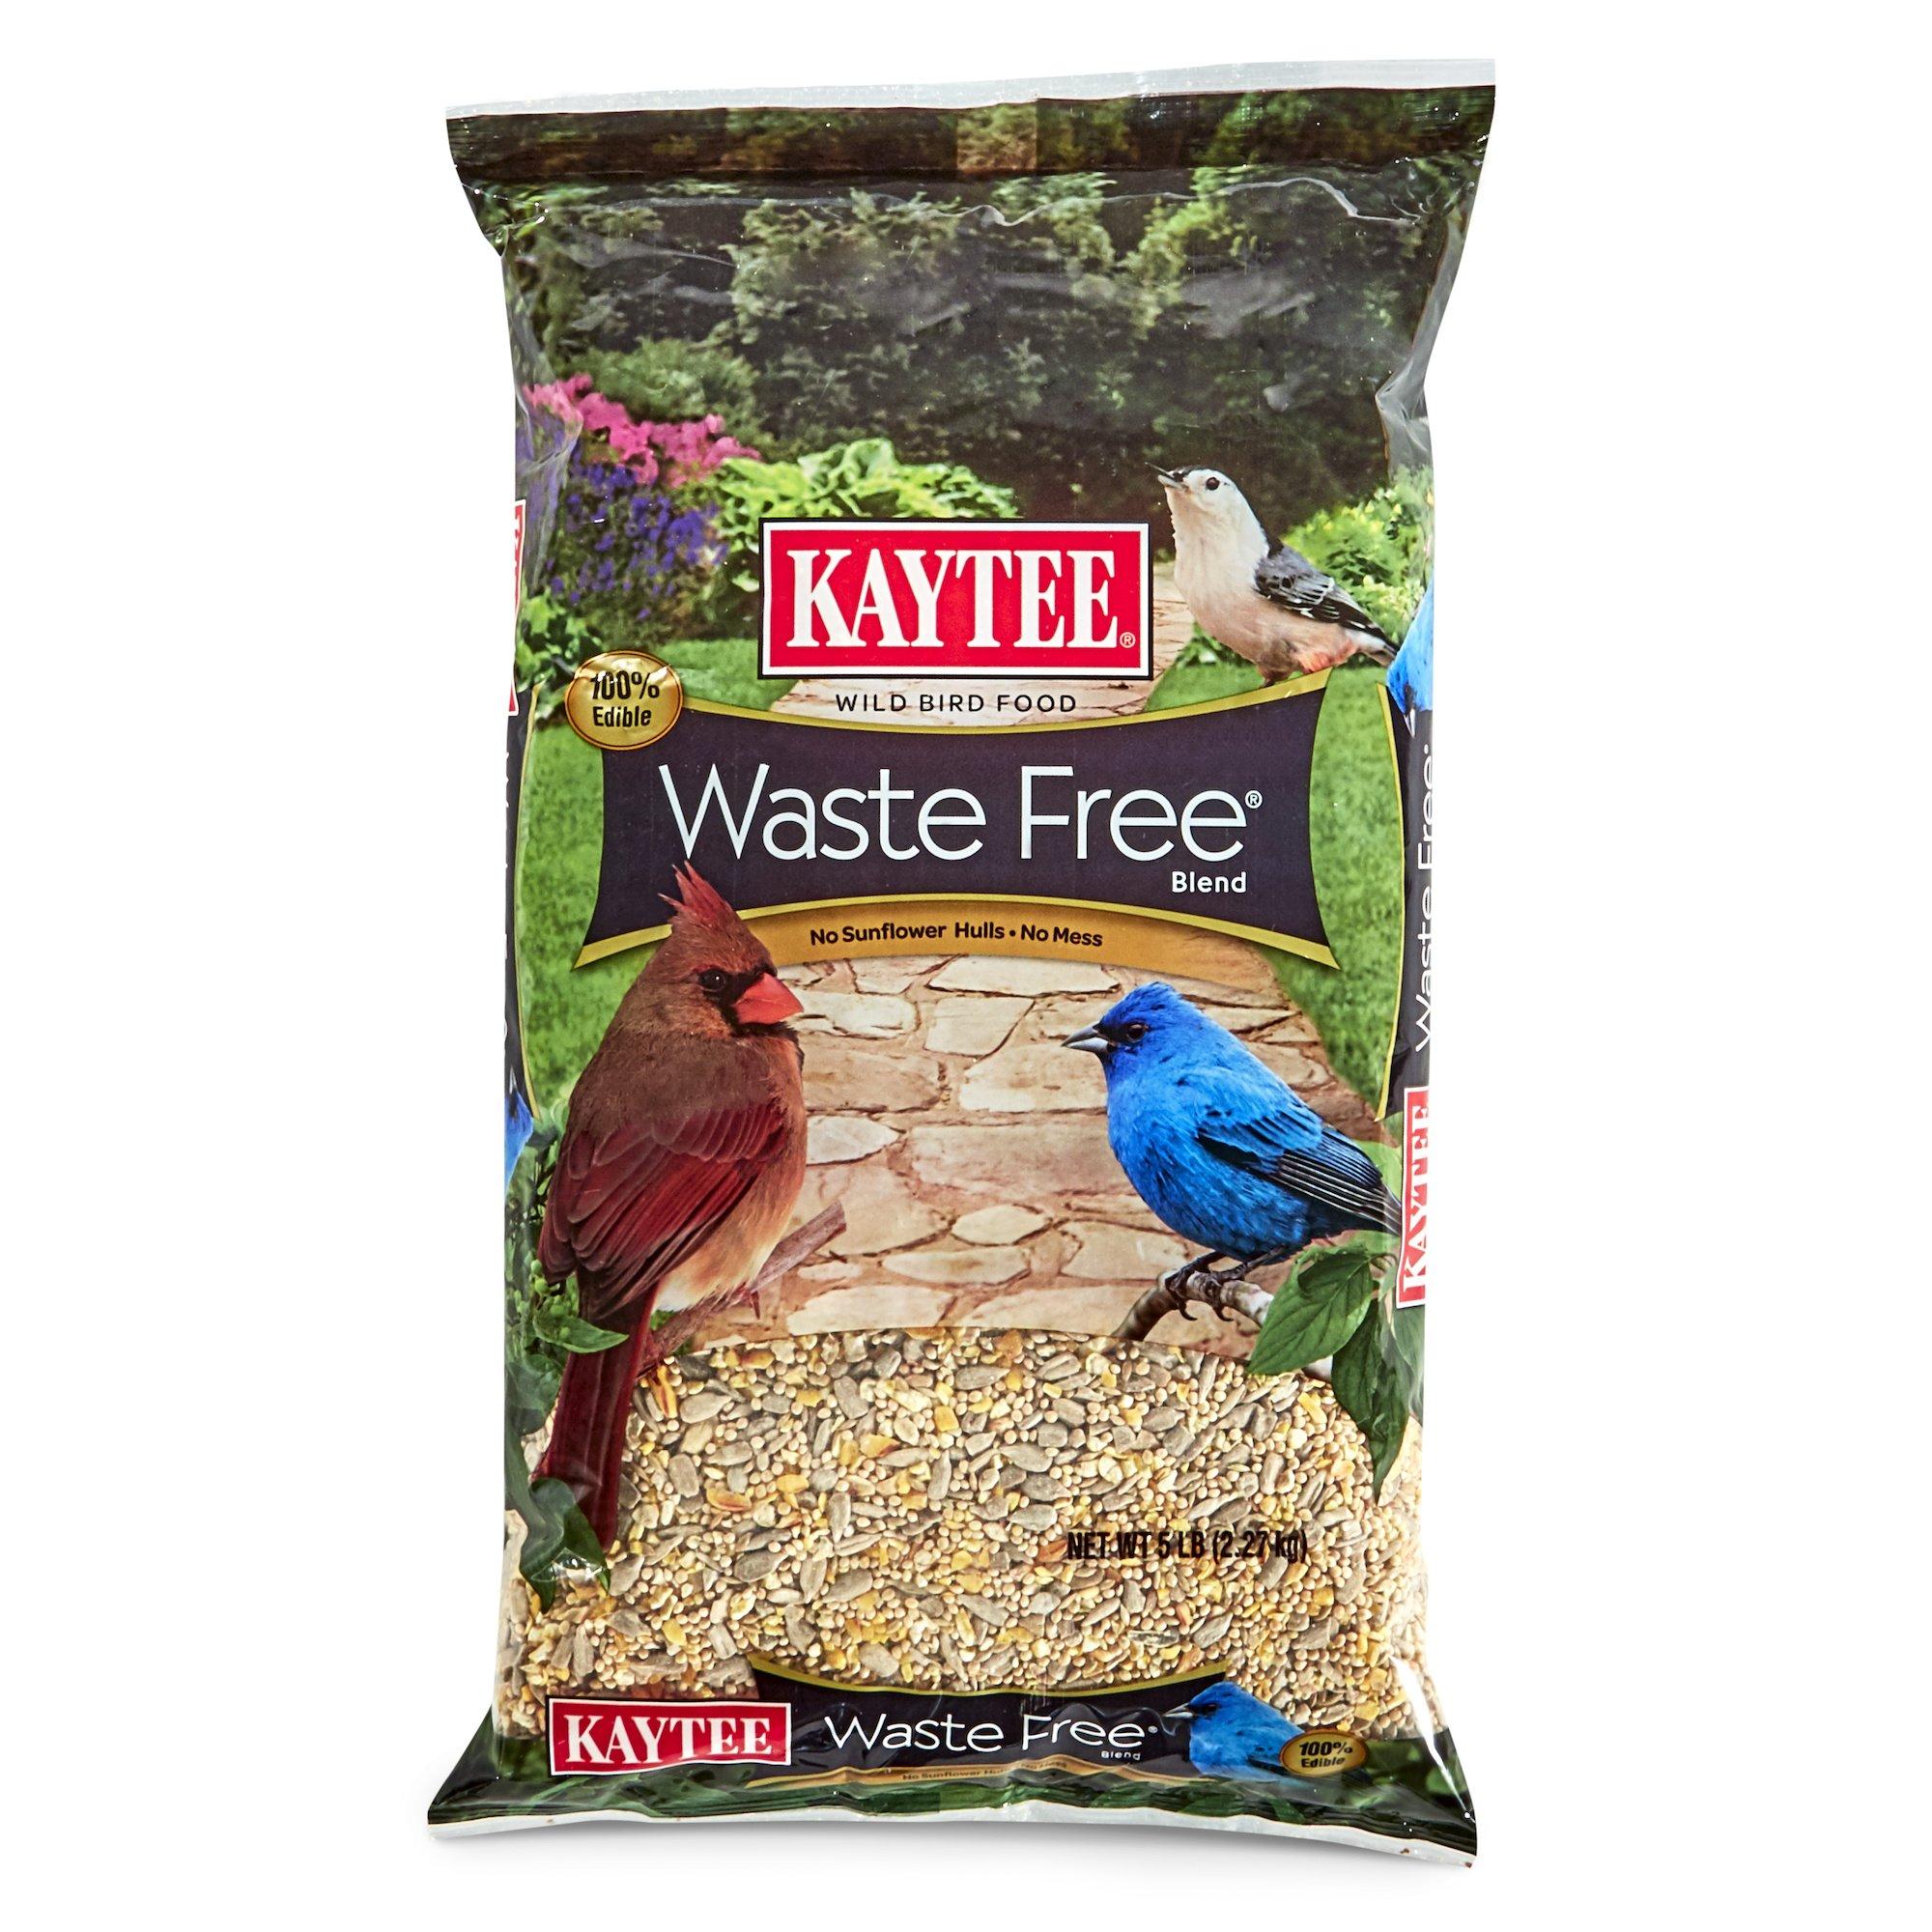 Kaytee Waste Free Bird Seed Blend, 5-Pound by Kaytee